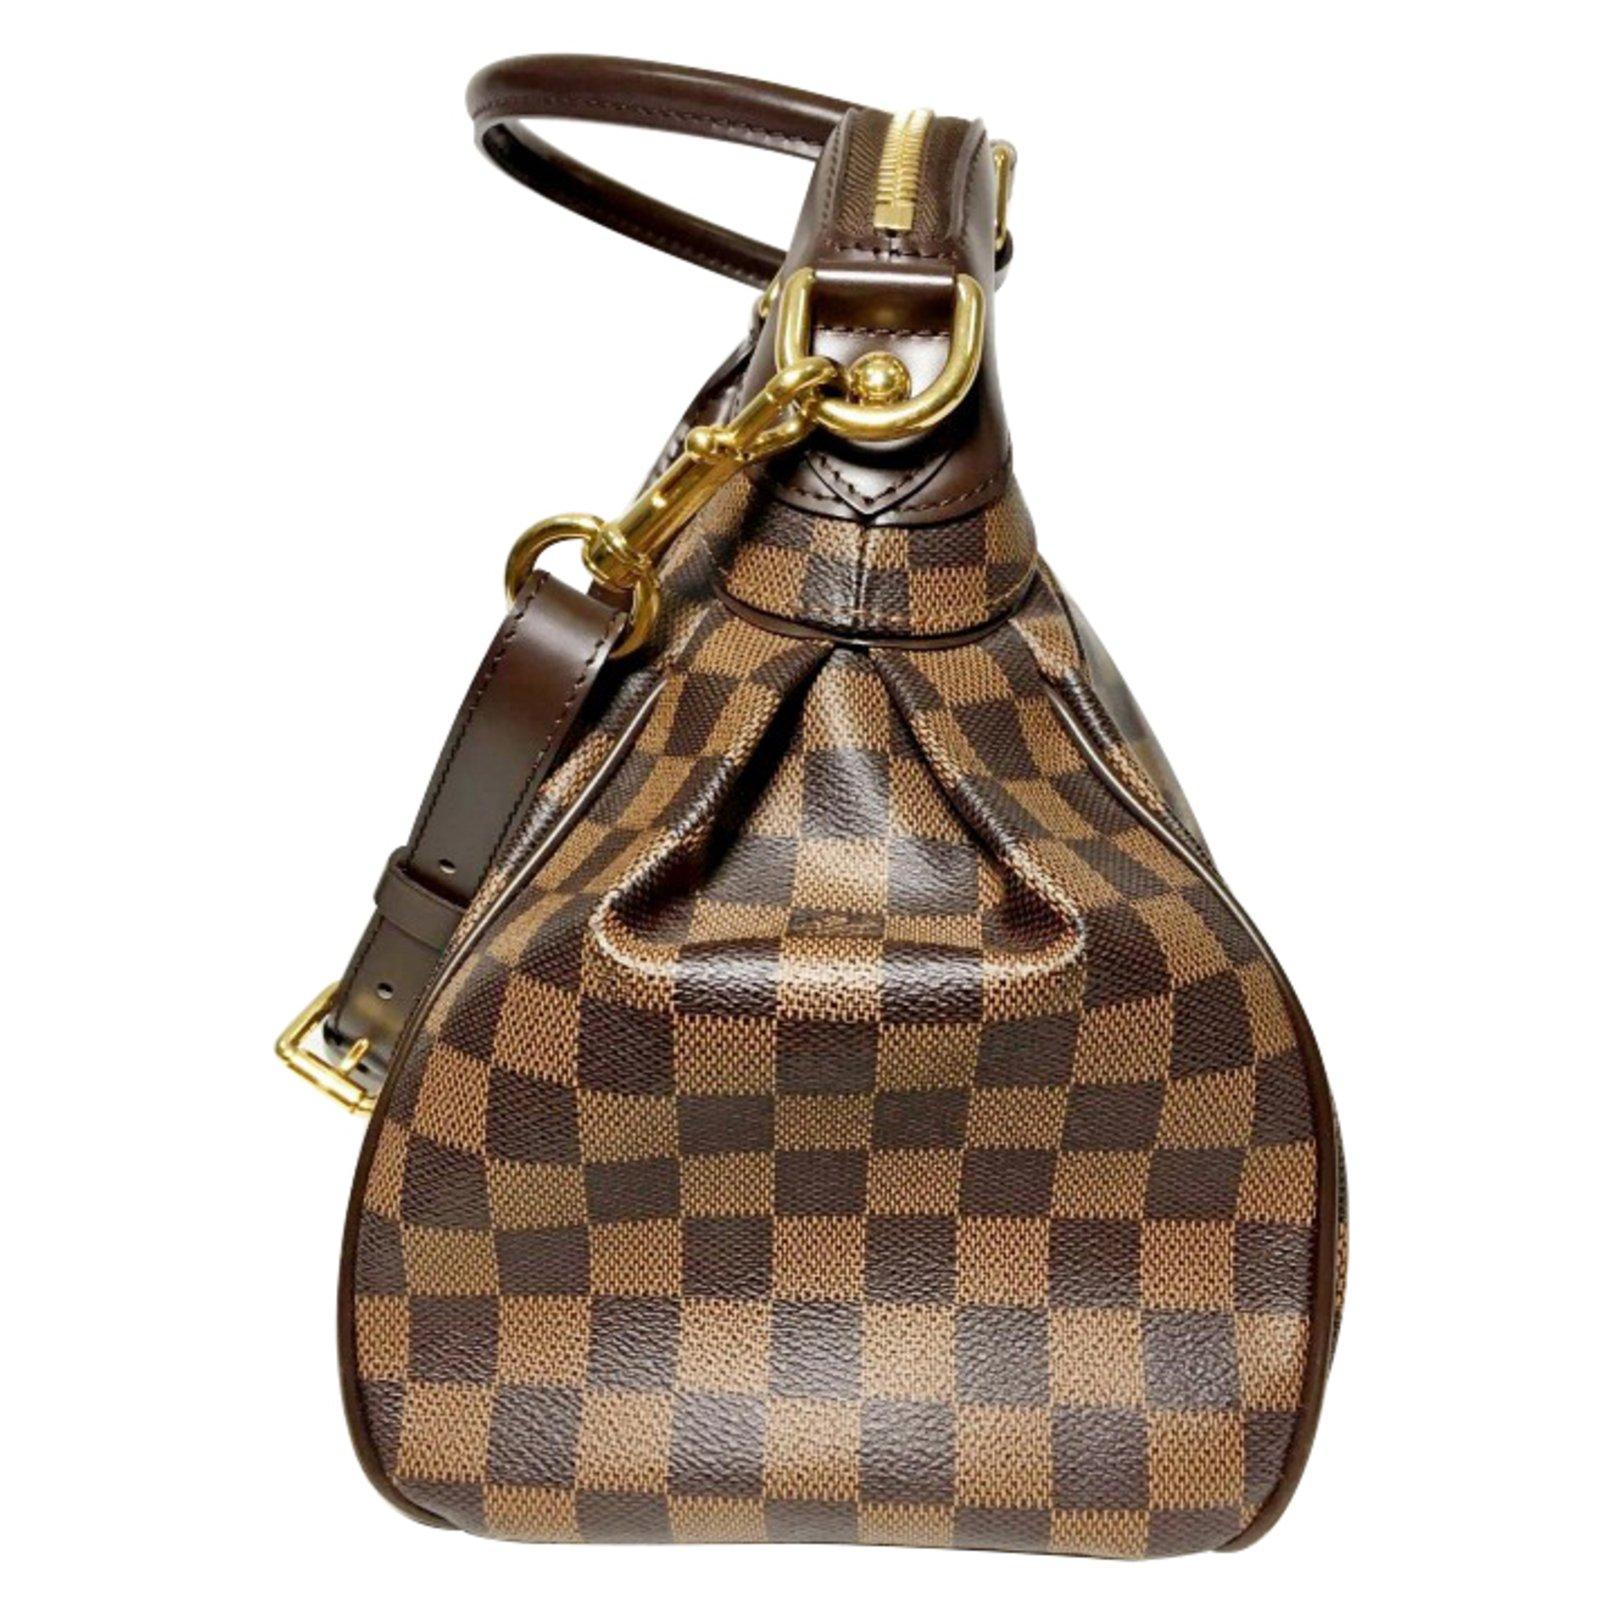 8cc7a51f1575 Louis Vuitton Damier Ebene Trevi GM Handbags Leather Brown ref.35131 - Joli  Closet